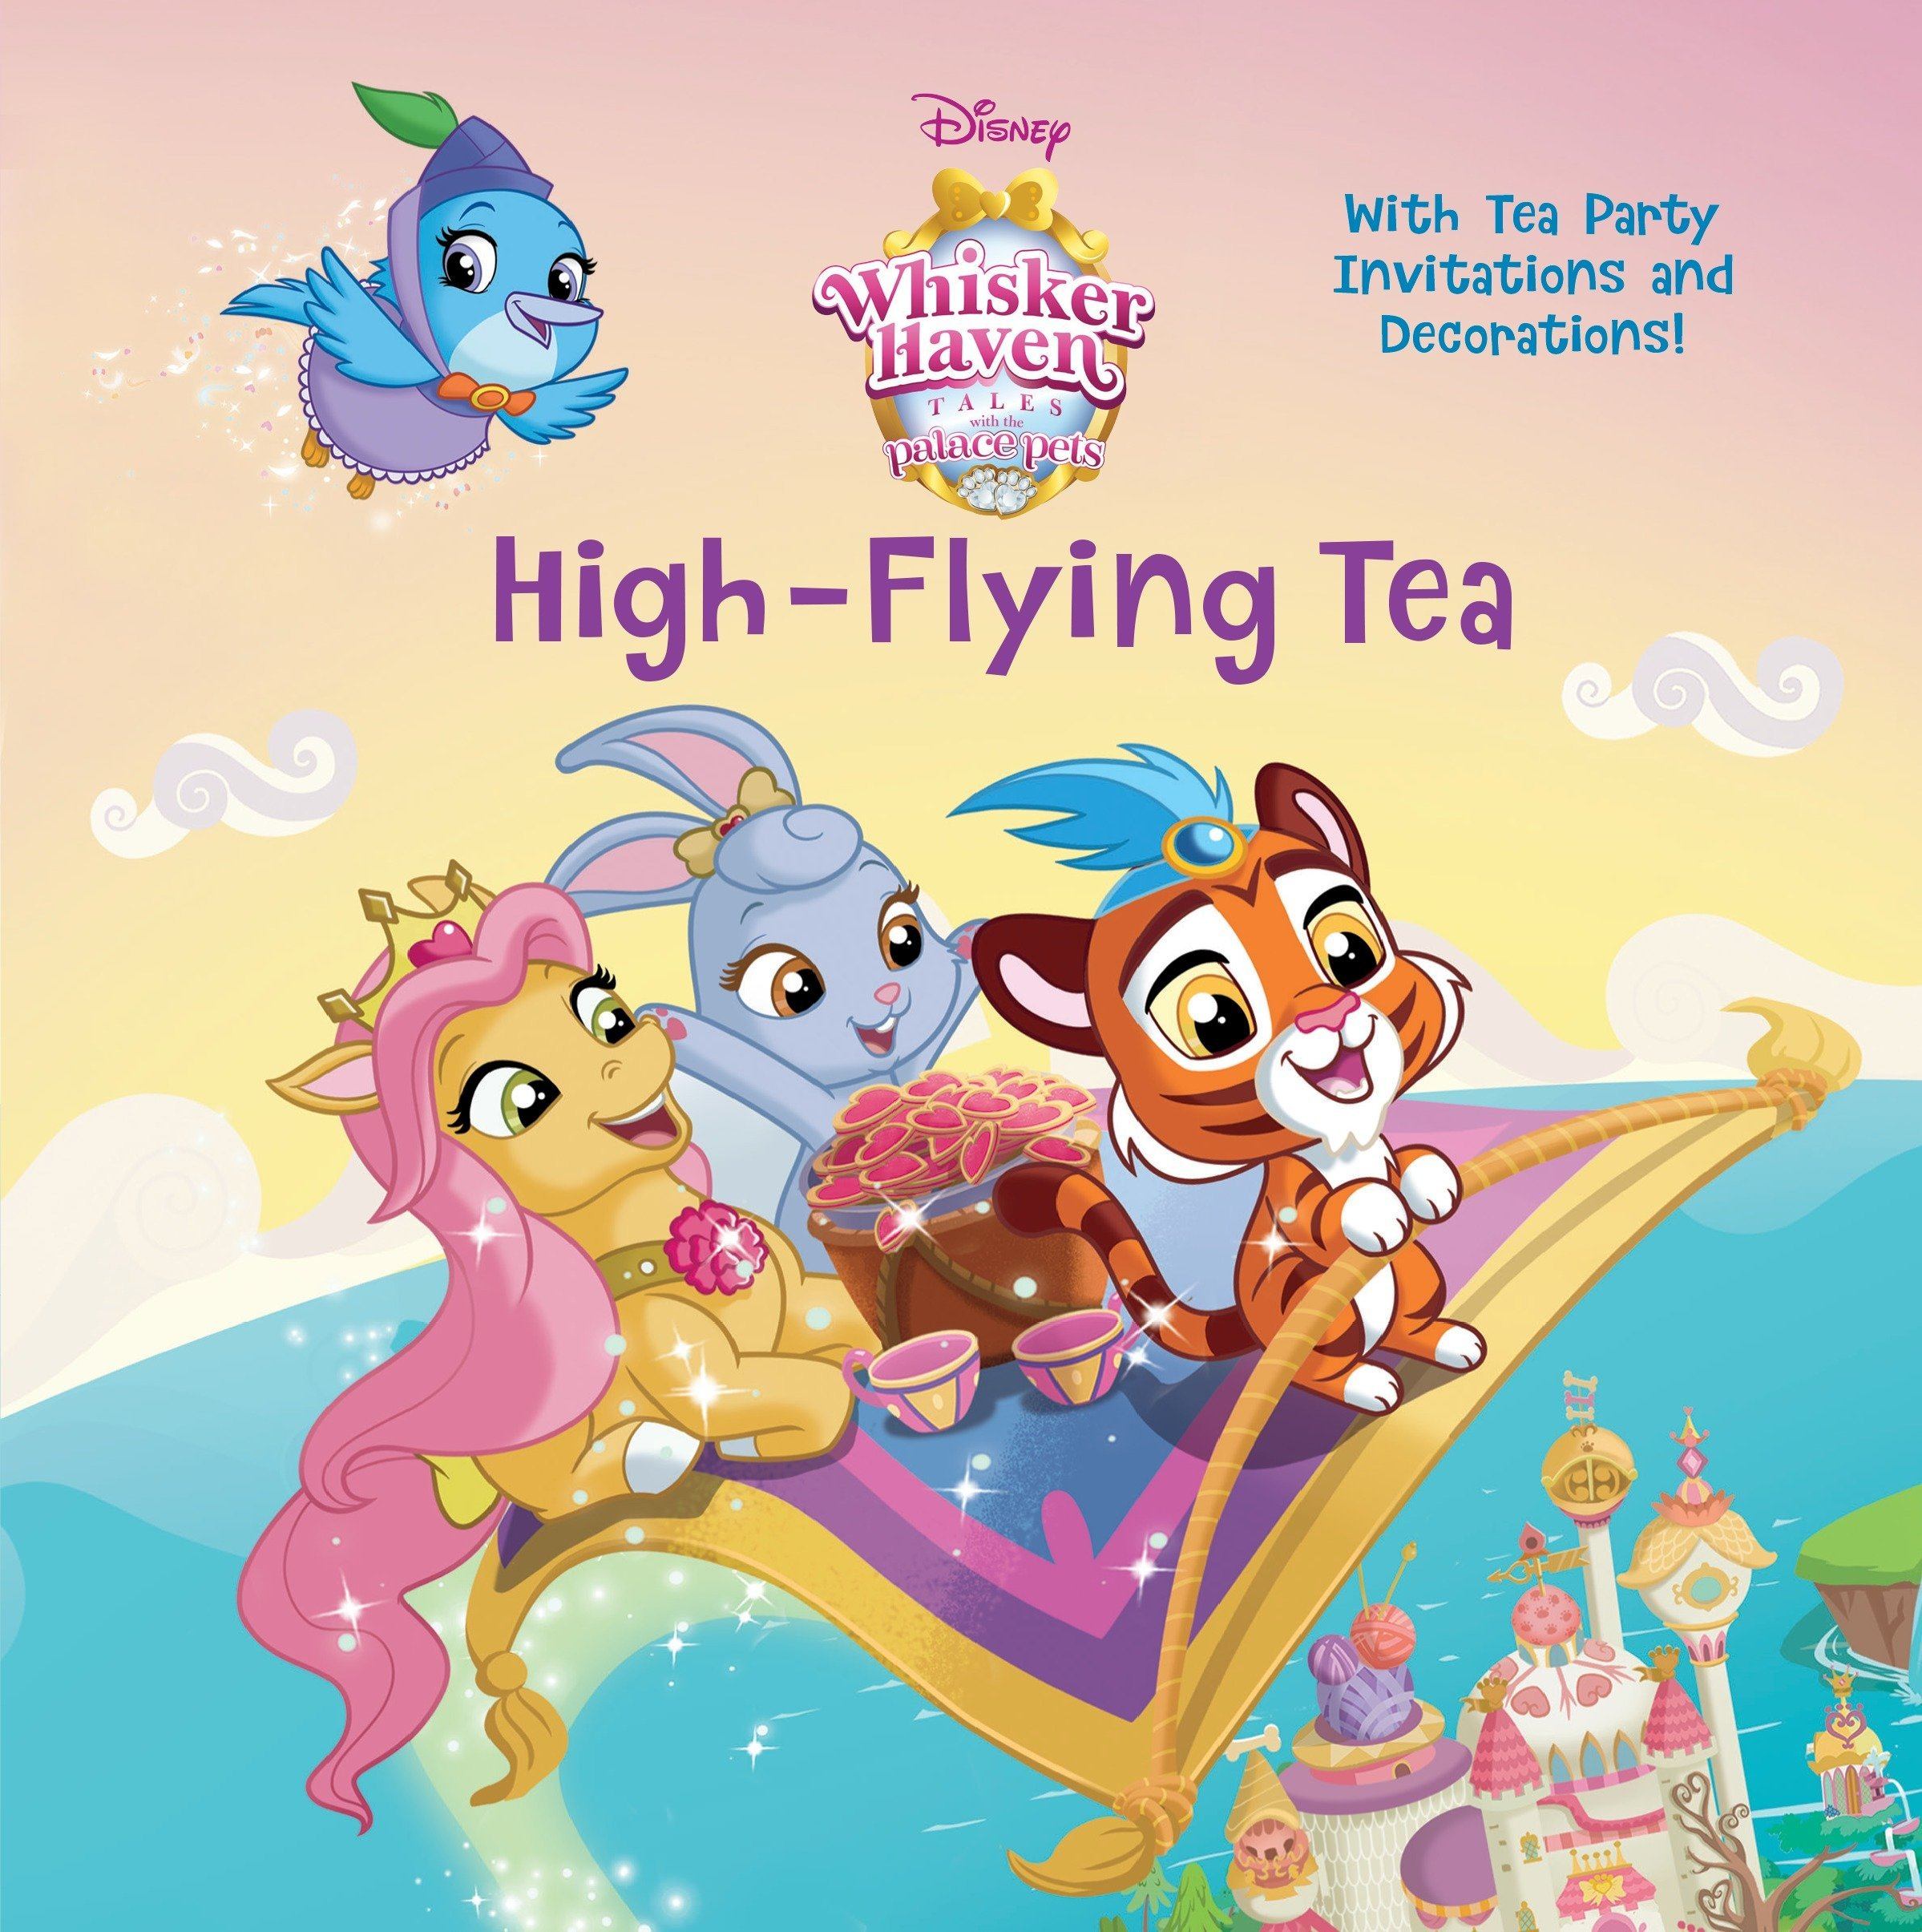 Download High-Flying Tea (Disney Palace Pets: Whisker Haven Tales) (Pictureback(R)) PDF